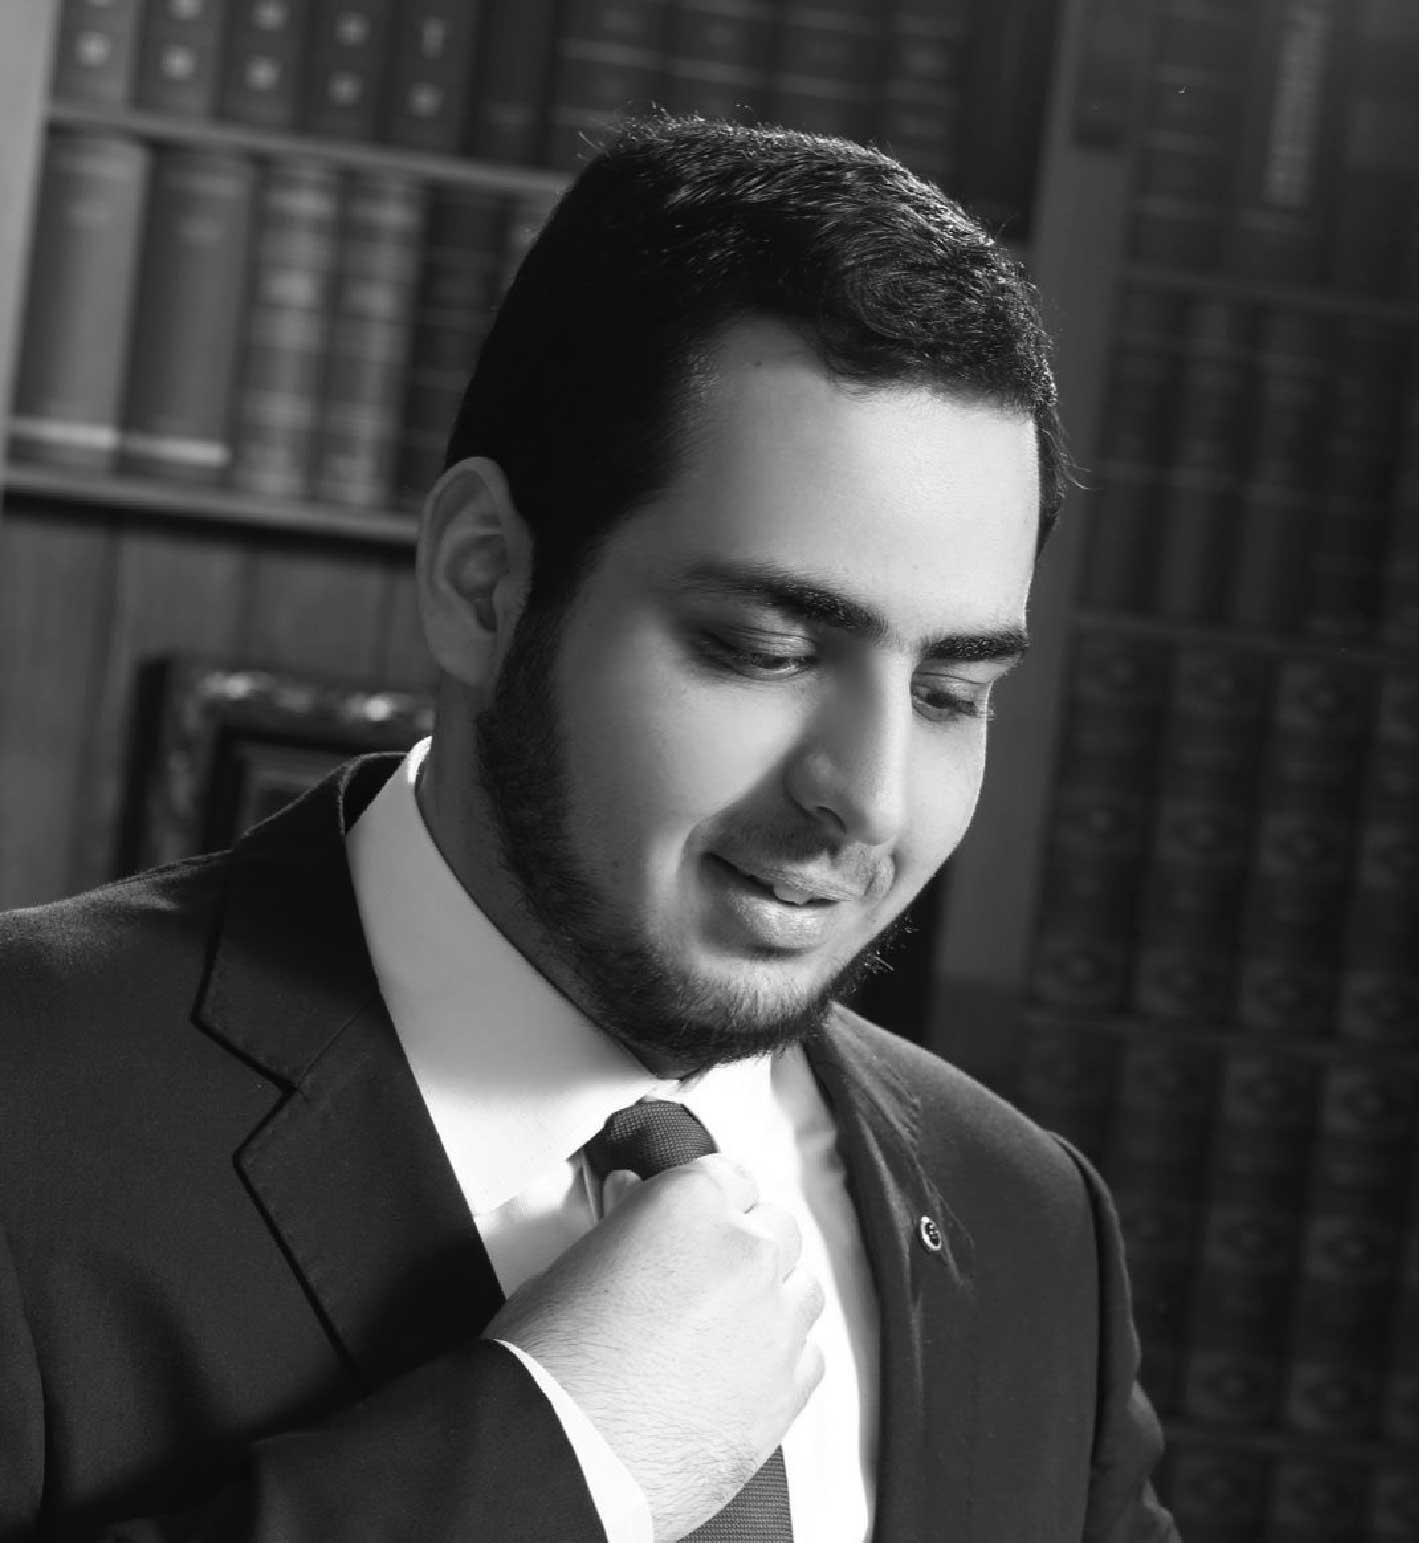 Eng. Abd-Alrahman Al-Horani